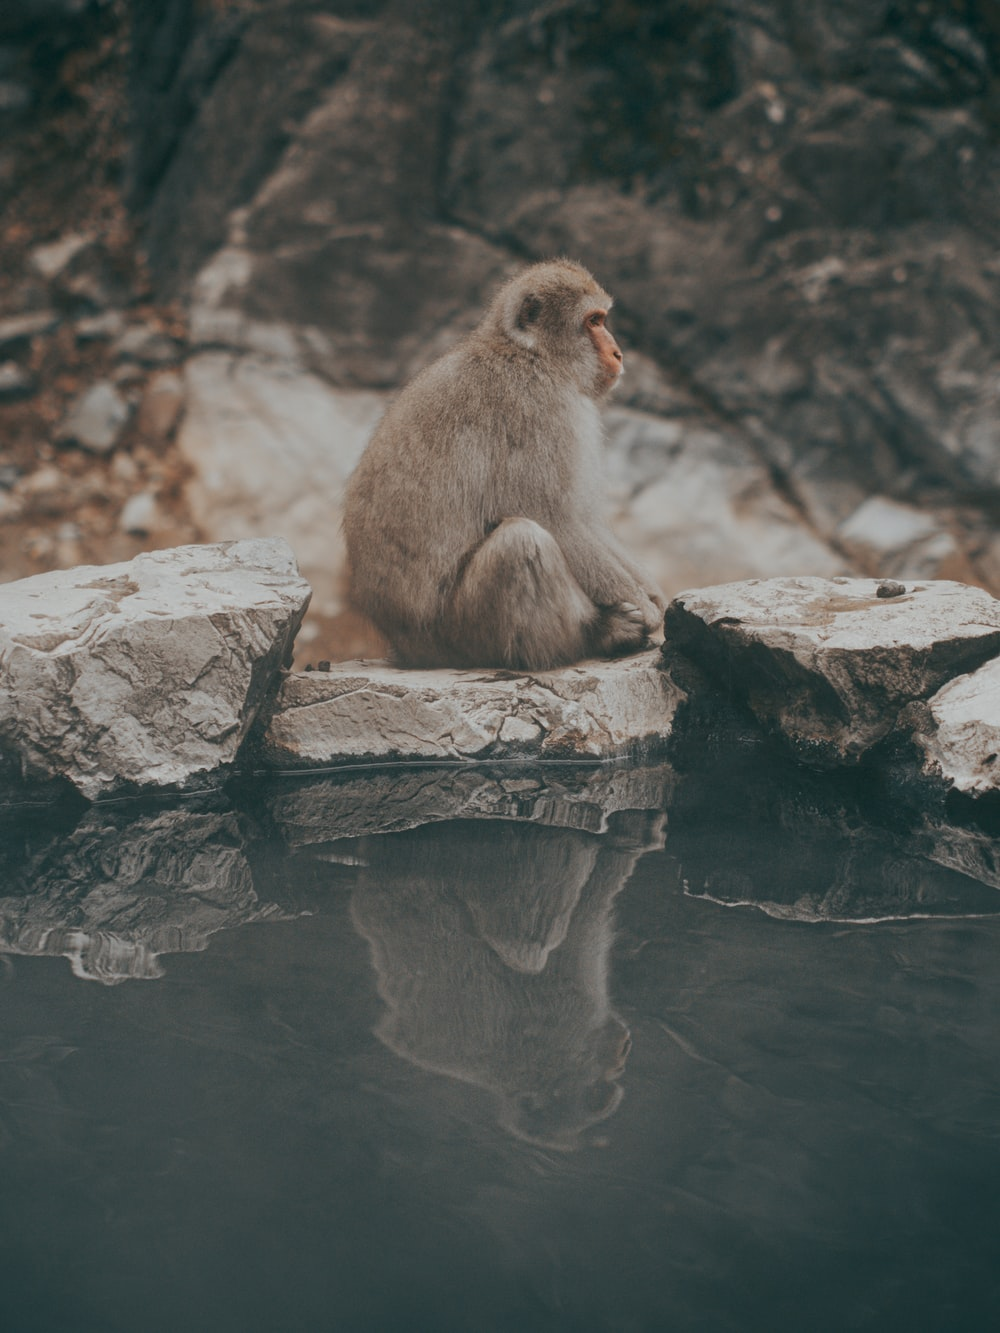 brown monkey sitting on gray rock during daytime